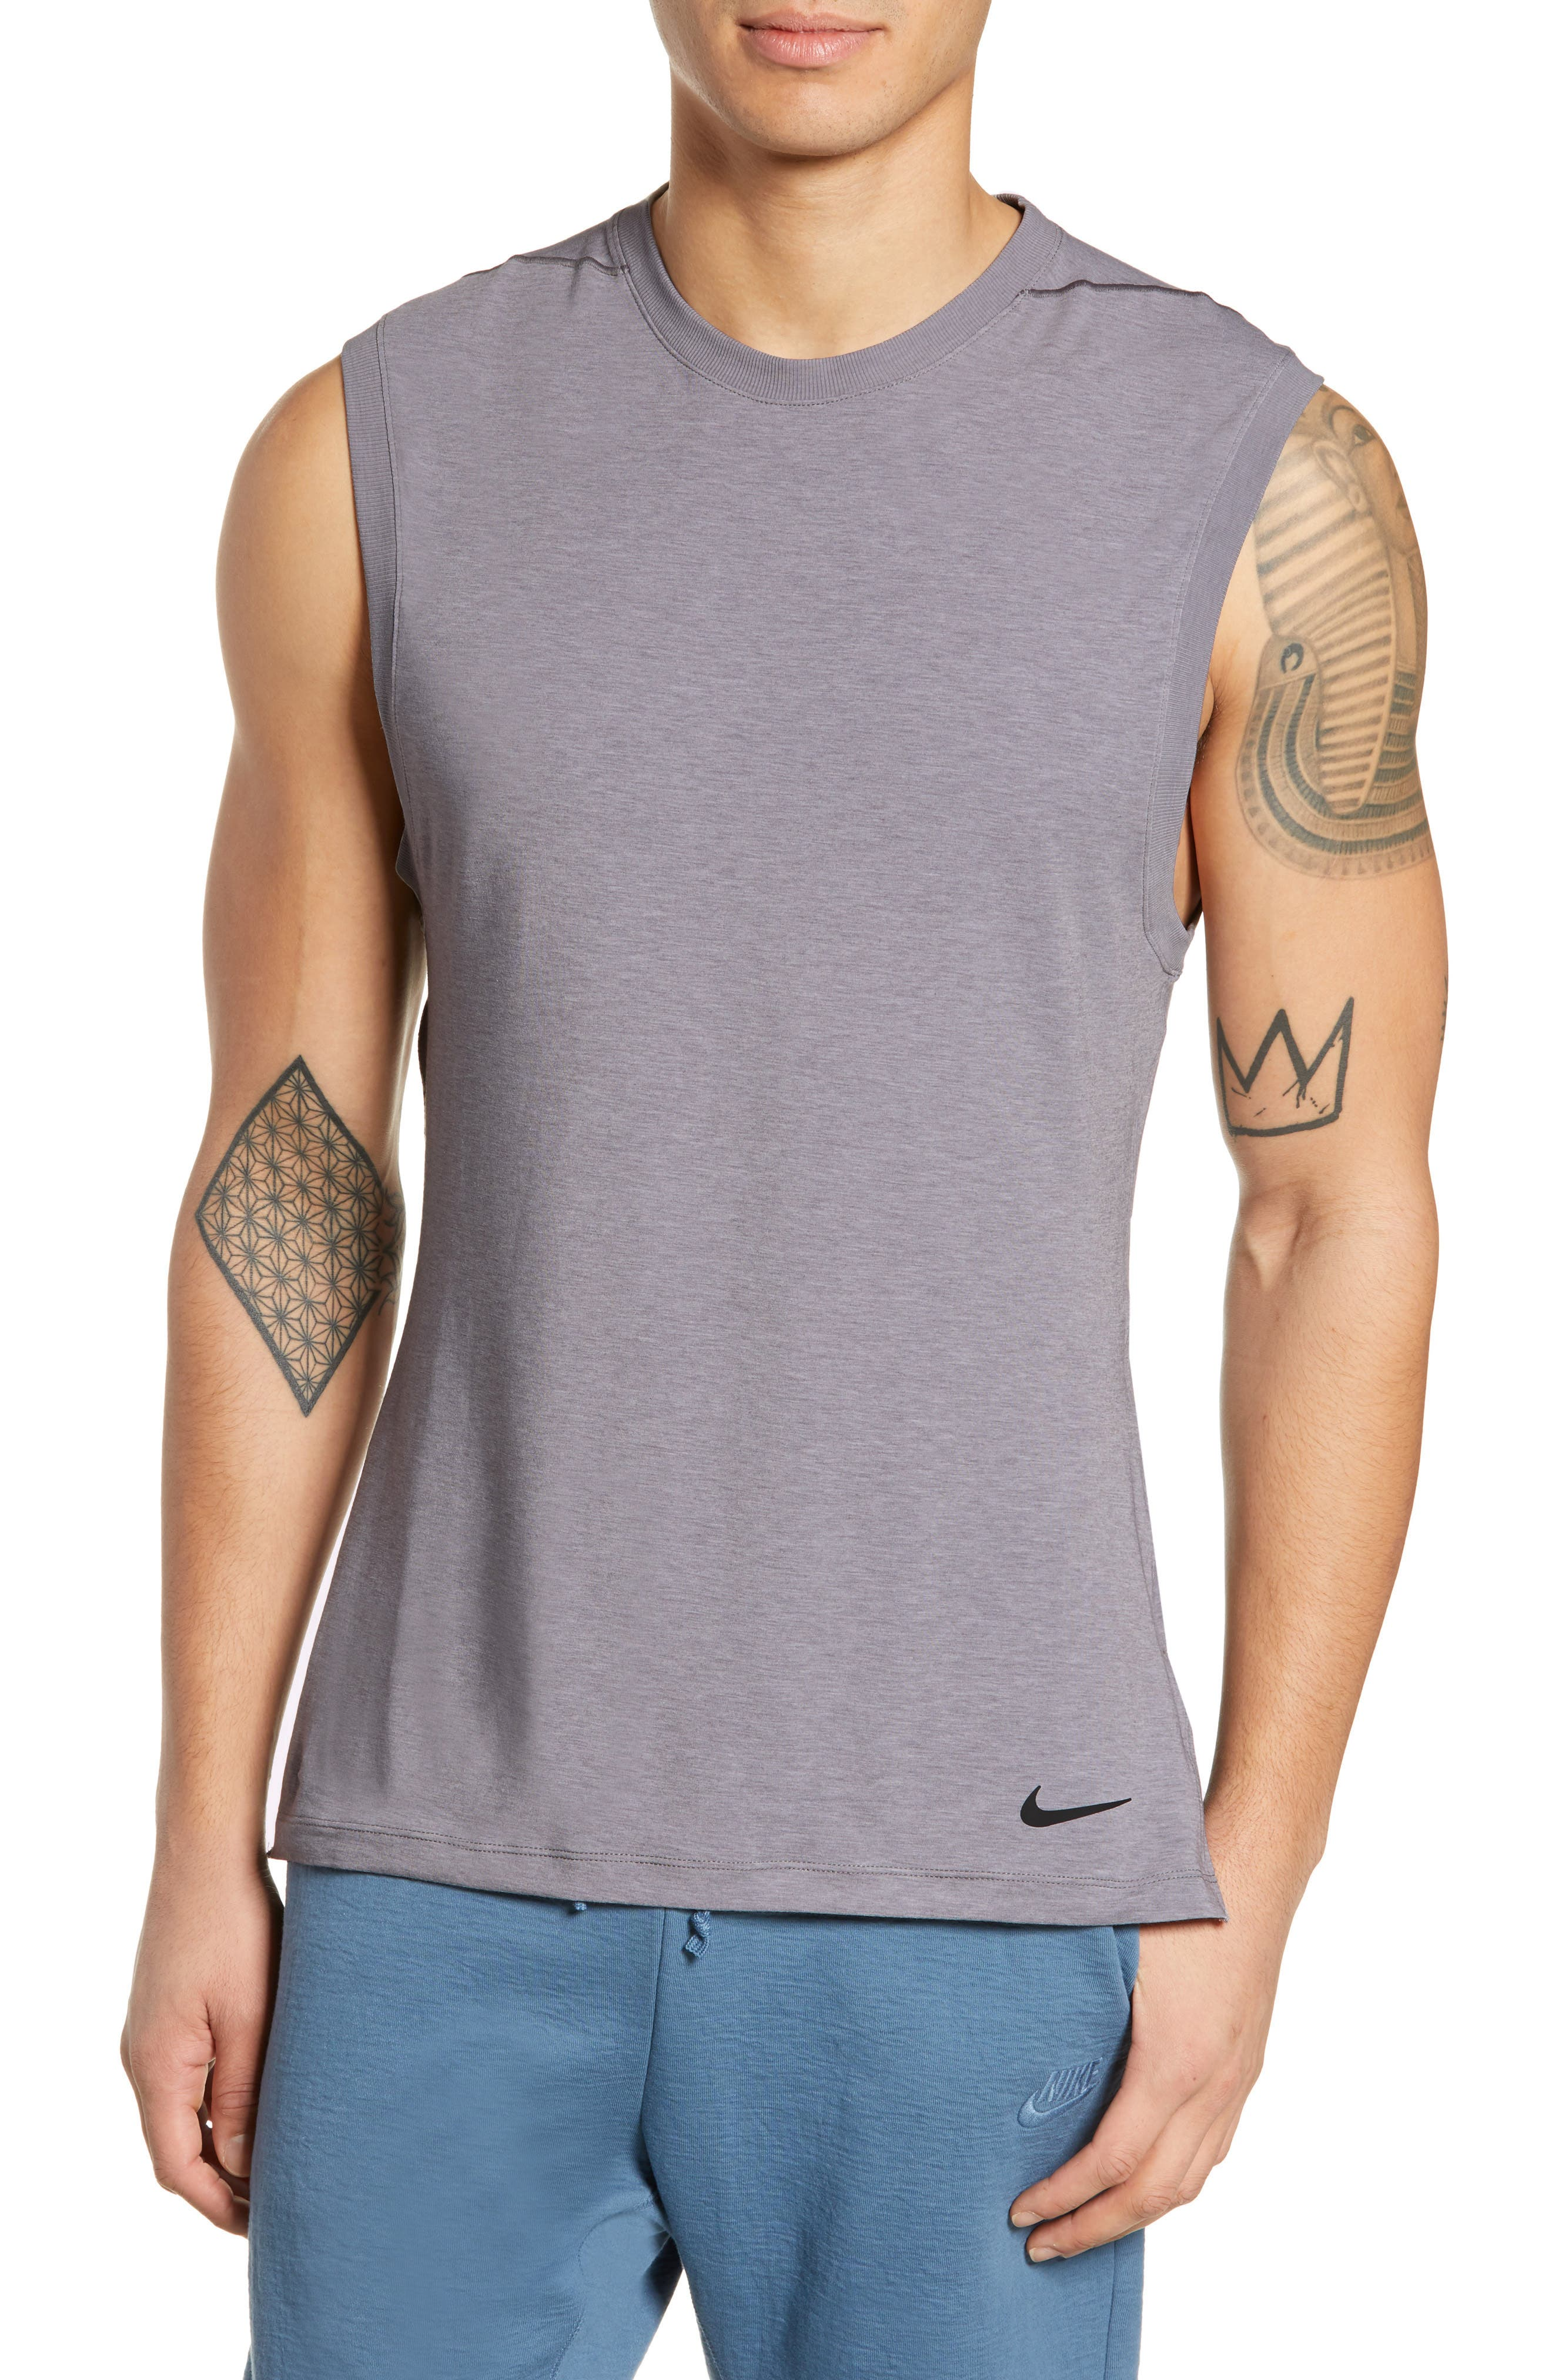 Nike Dry Transcent Sleeveless T-Shirt Grey